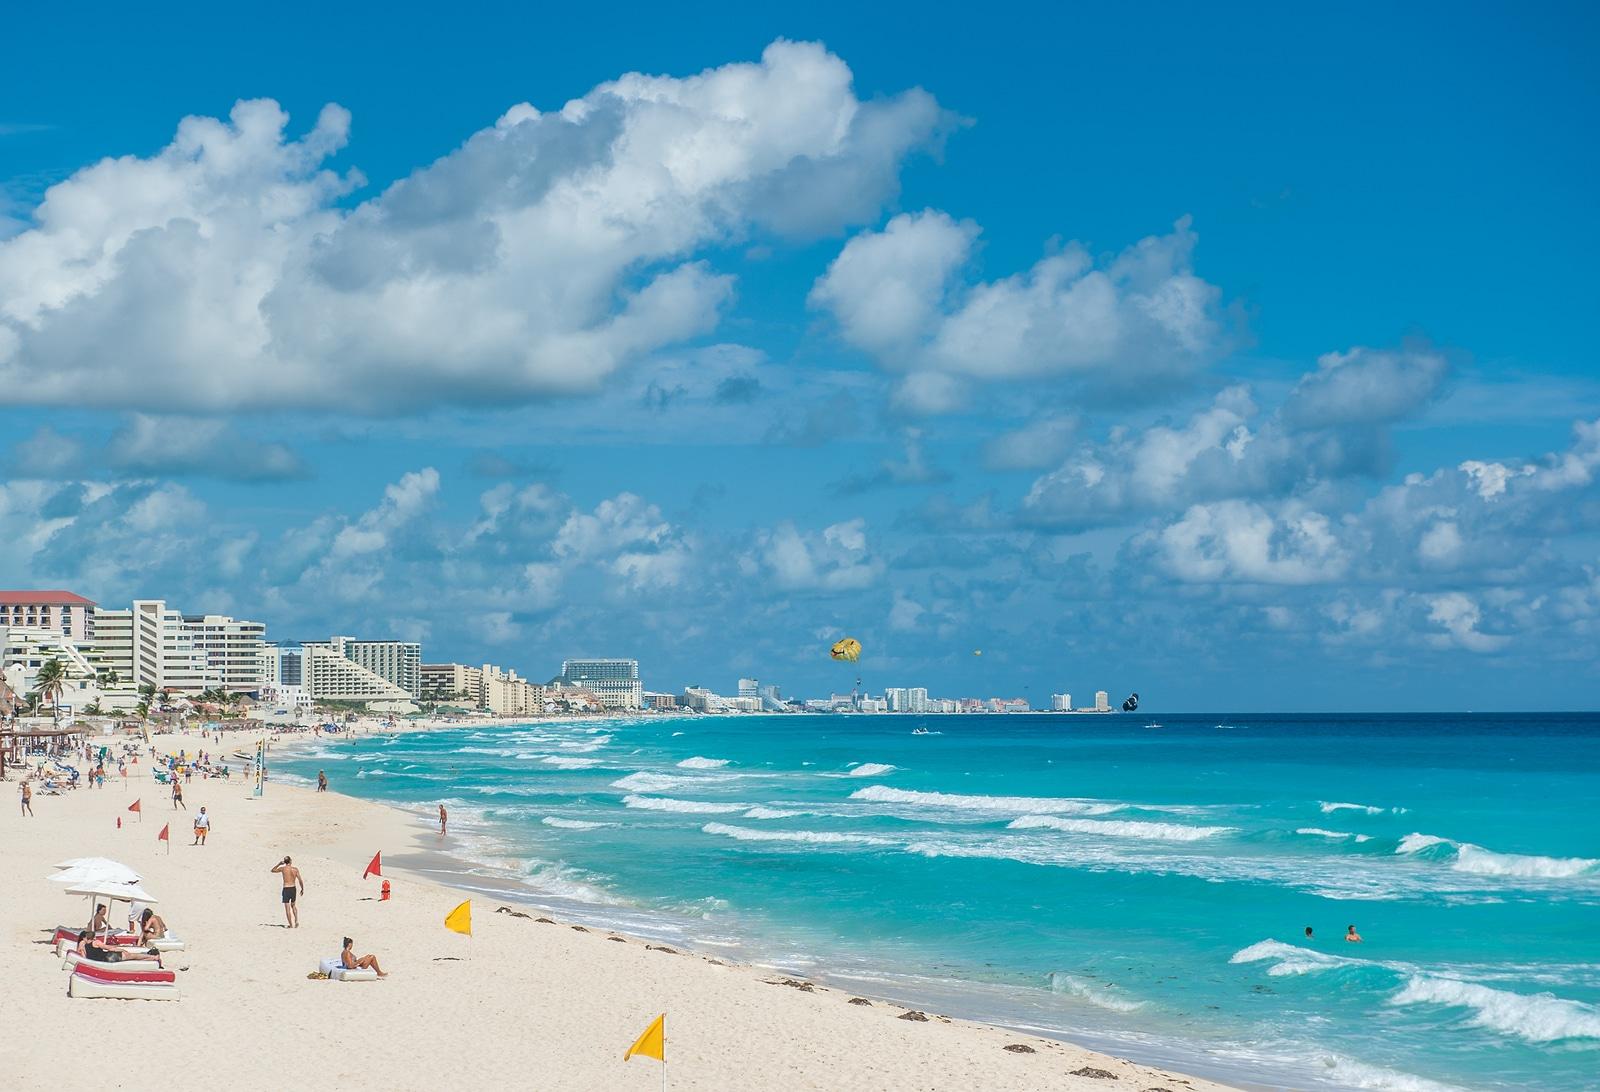 Krystal International Vacation Club Highlights Sightseeing in Cancun